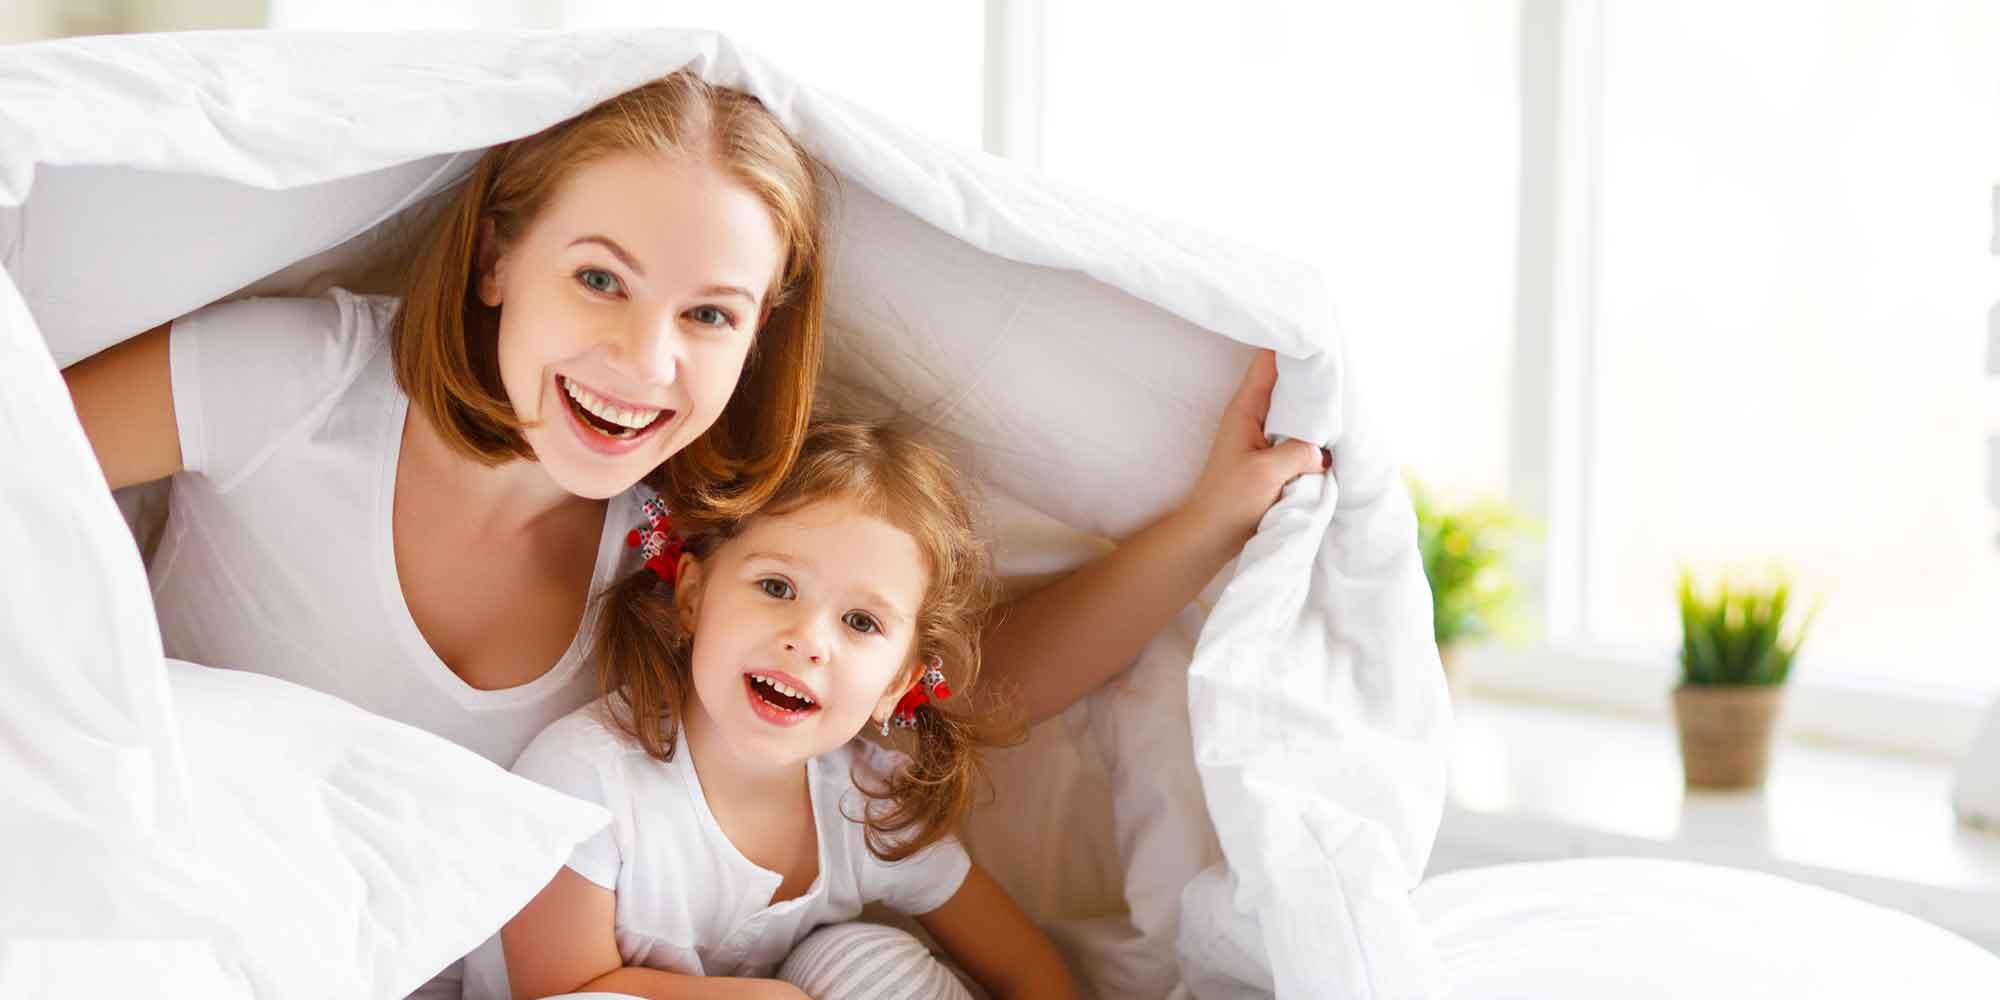 Allergo Natur Bettbezug Für Allergiker Allergo Natur